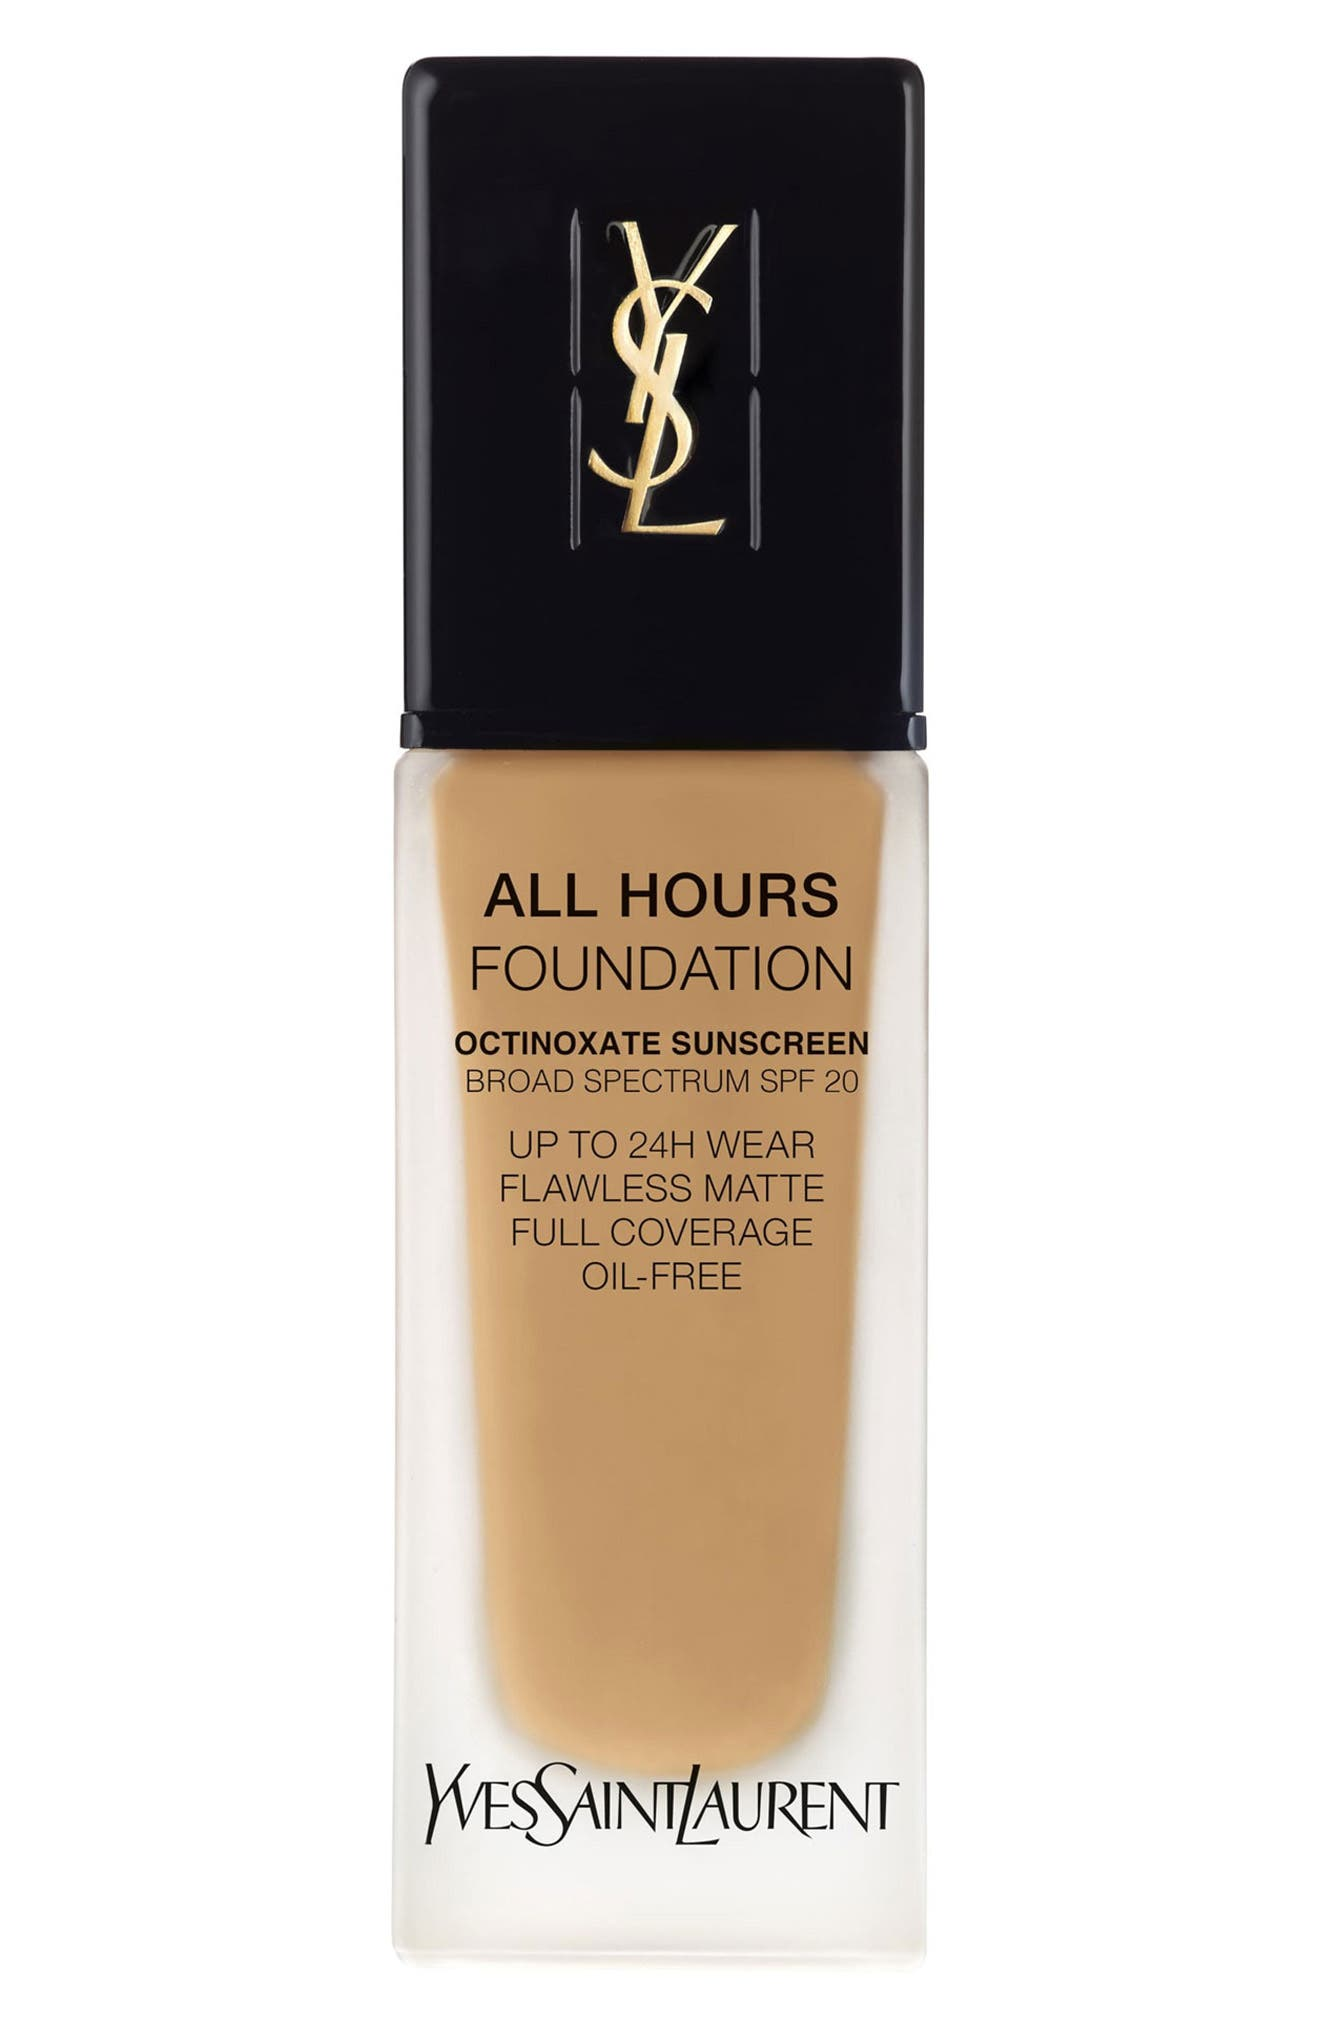 Yves Saint Laurent All Hours Full Coverage Matte Foundation Spf 20 - Bd60 Warm Amber